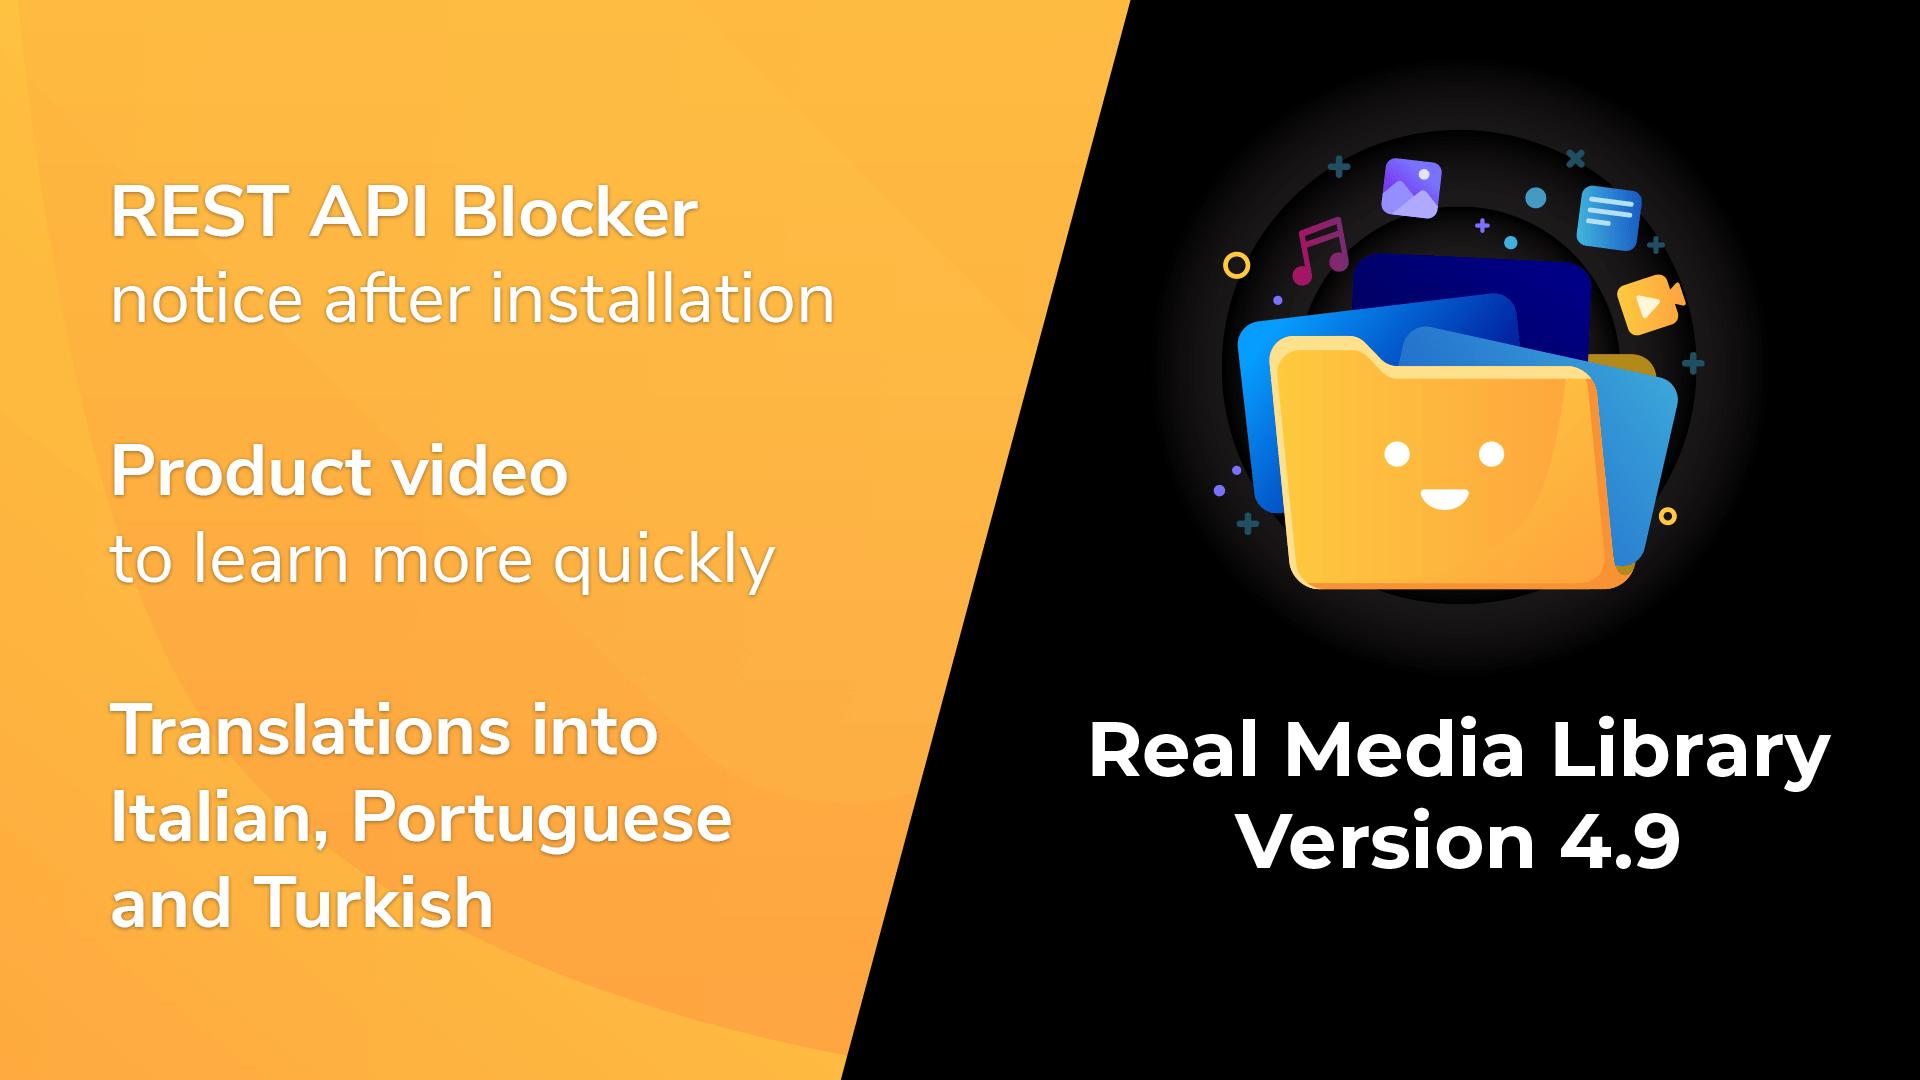 Real Media Library Version 4.9